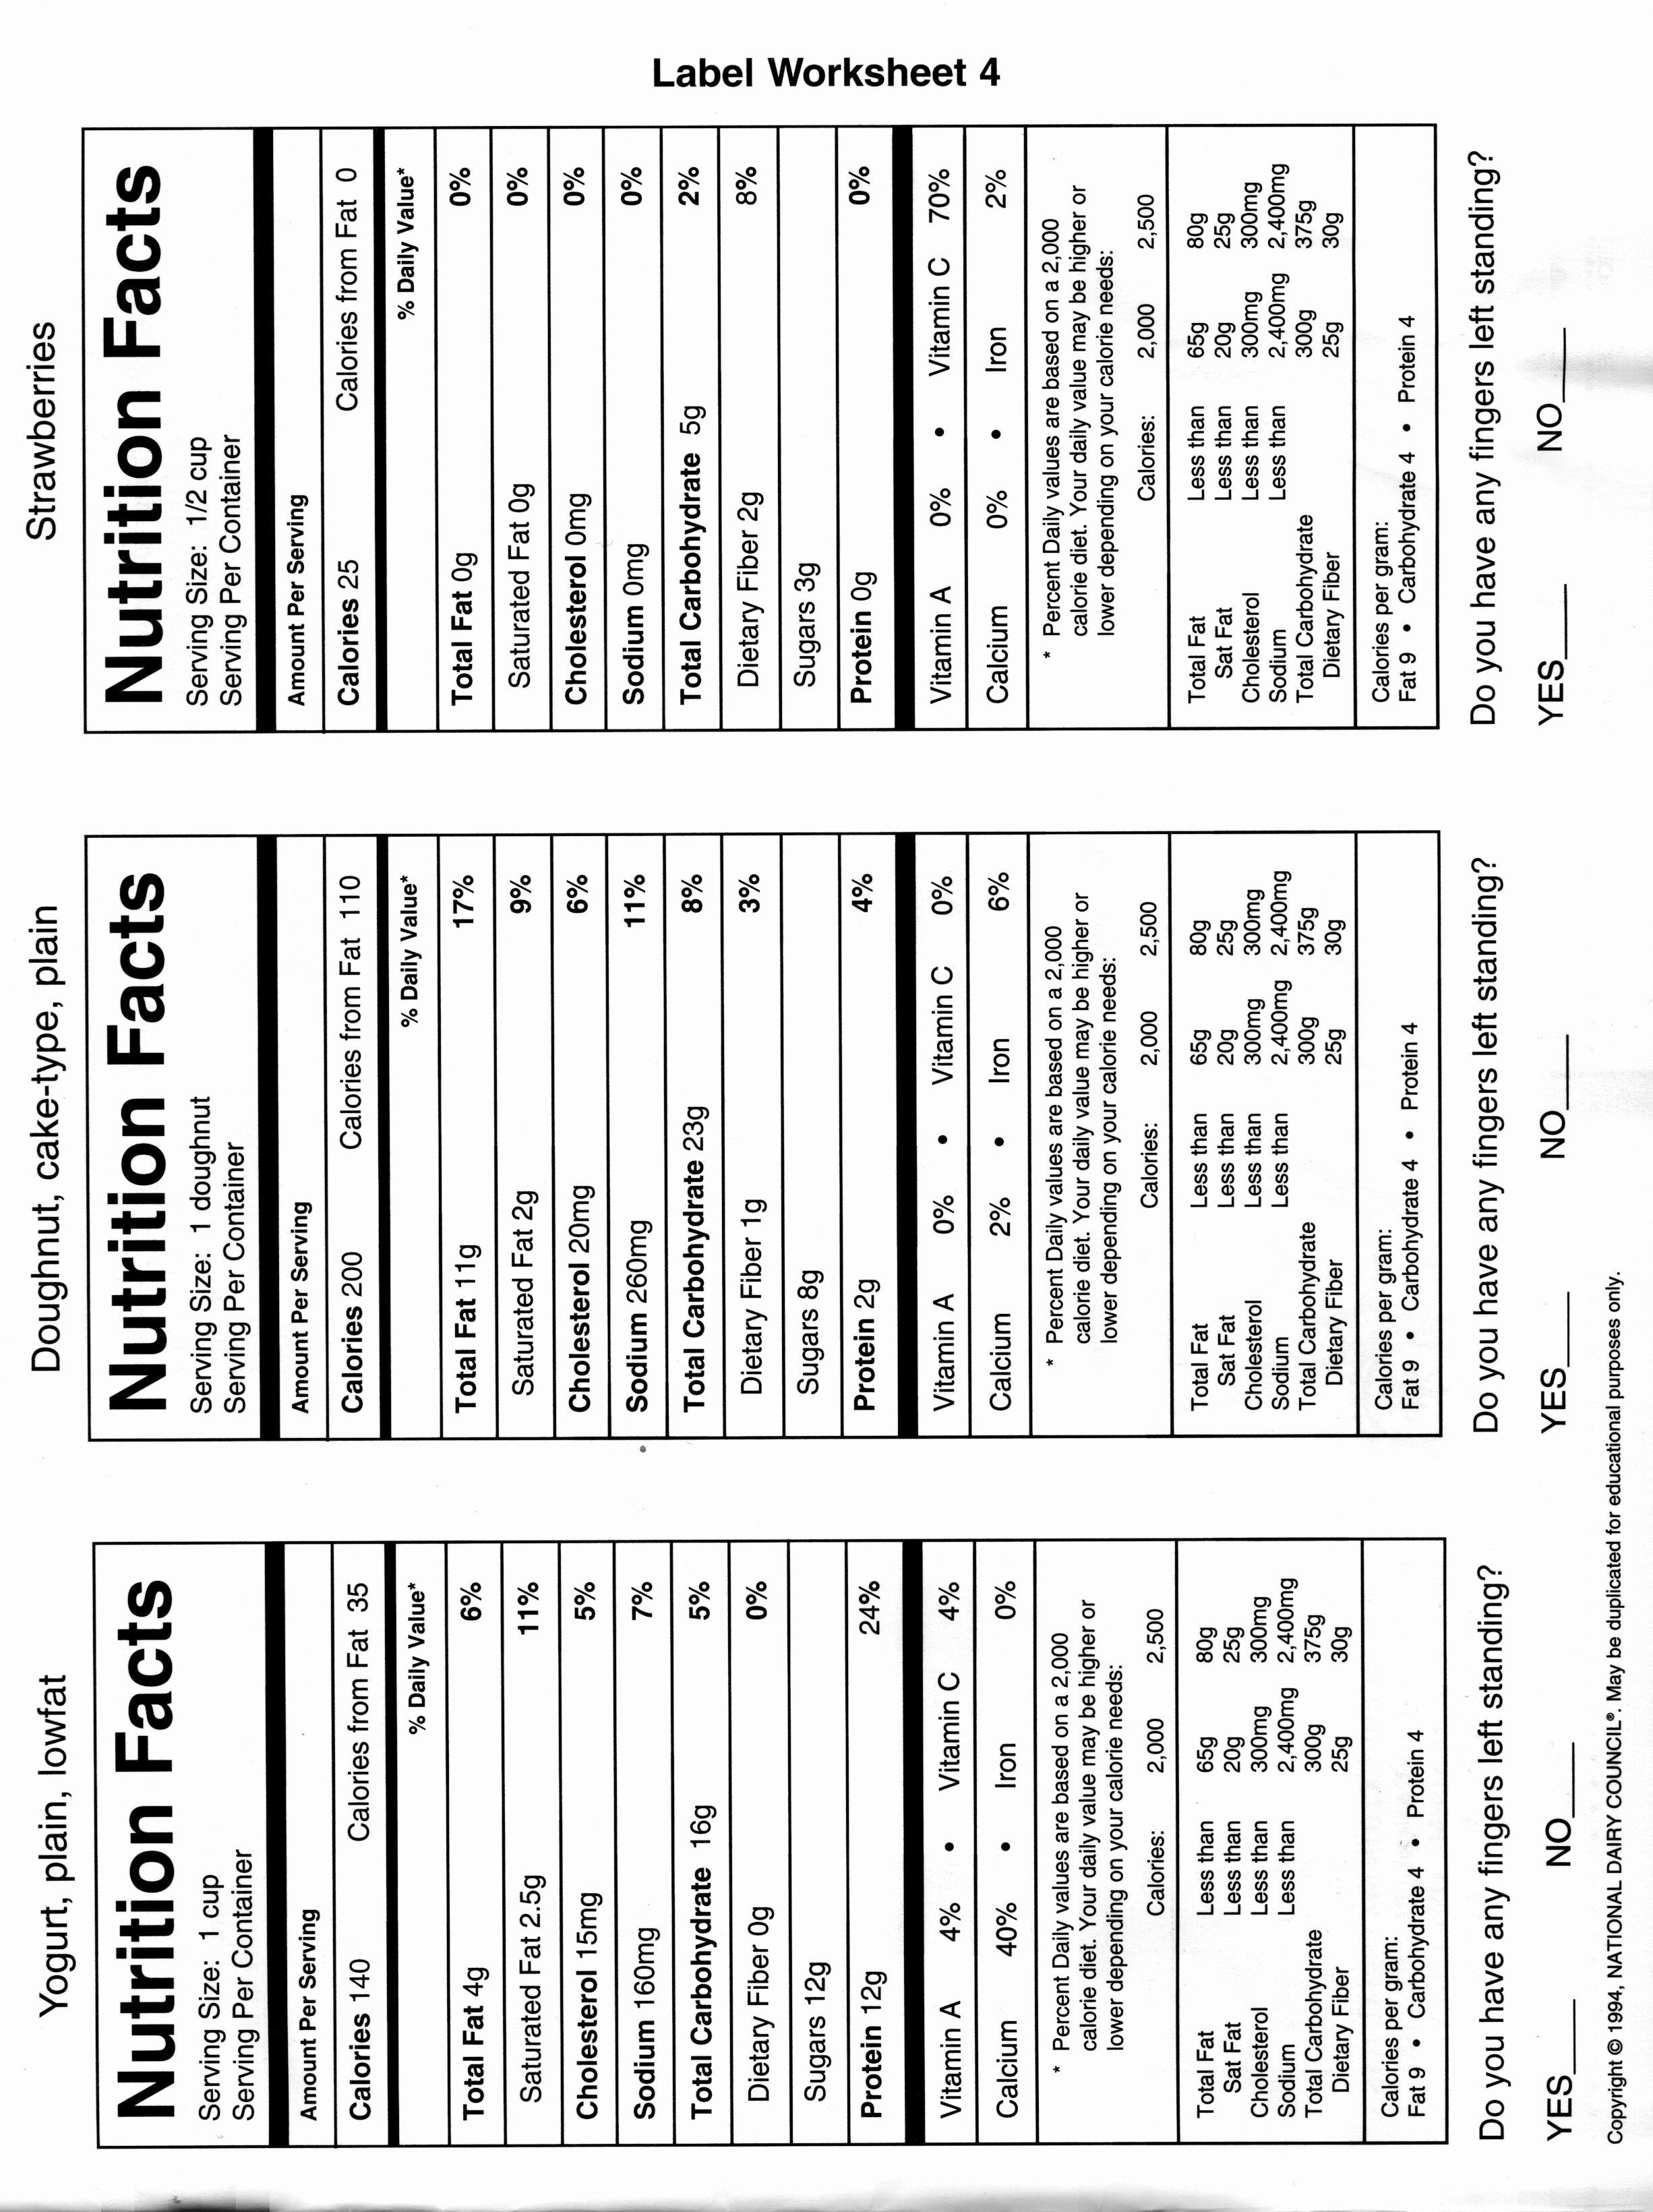 Blank Nutrition Label Worksheet New 15 Best Of Diet Worksheets In Pdf Blank Nutrition Reading Food Labels Nutrition Labels Label Templates